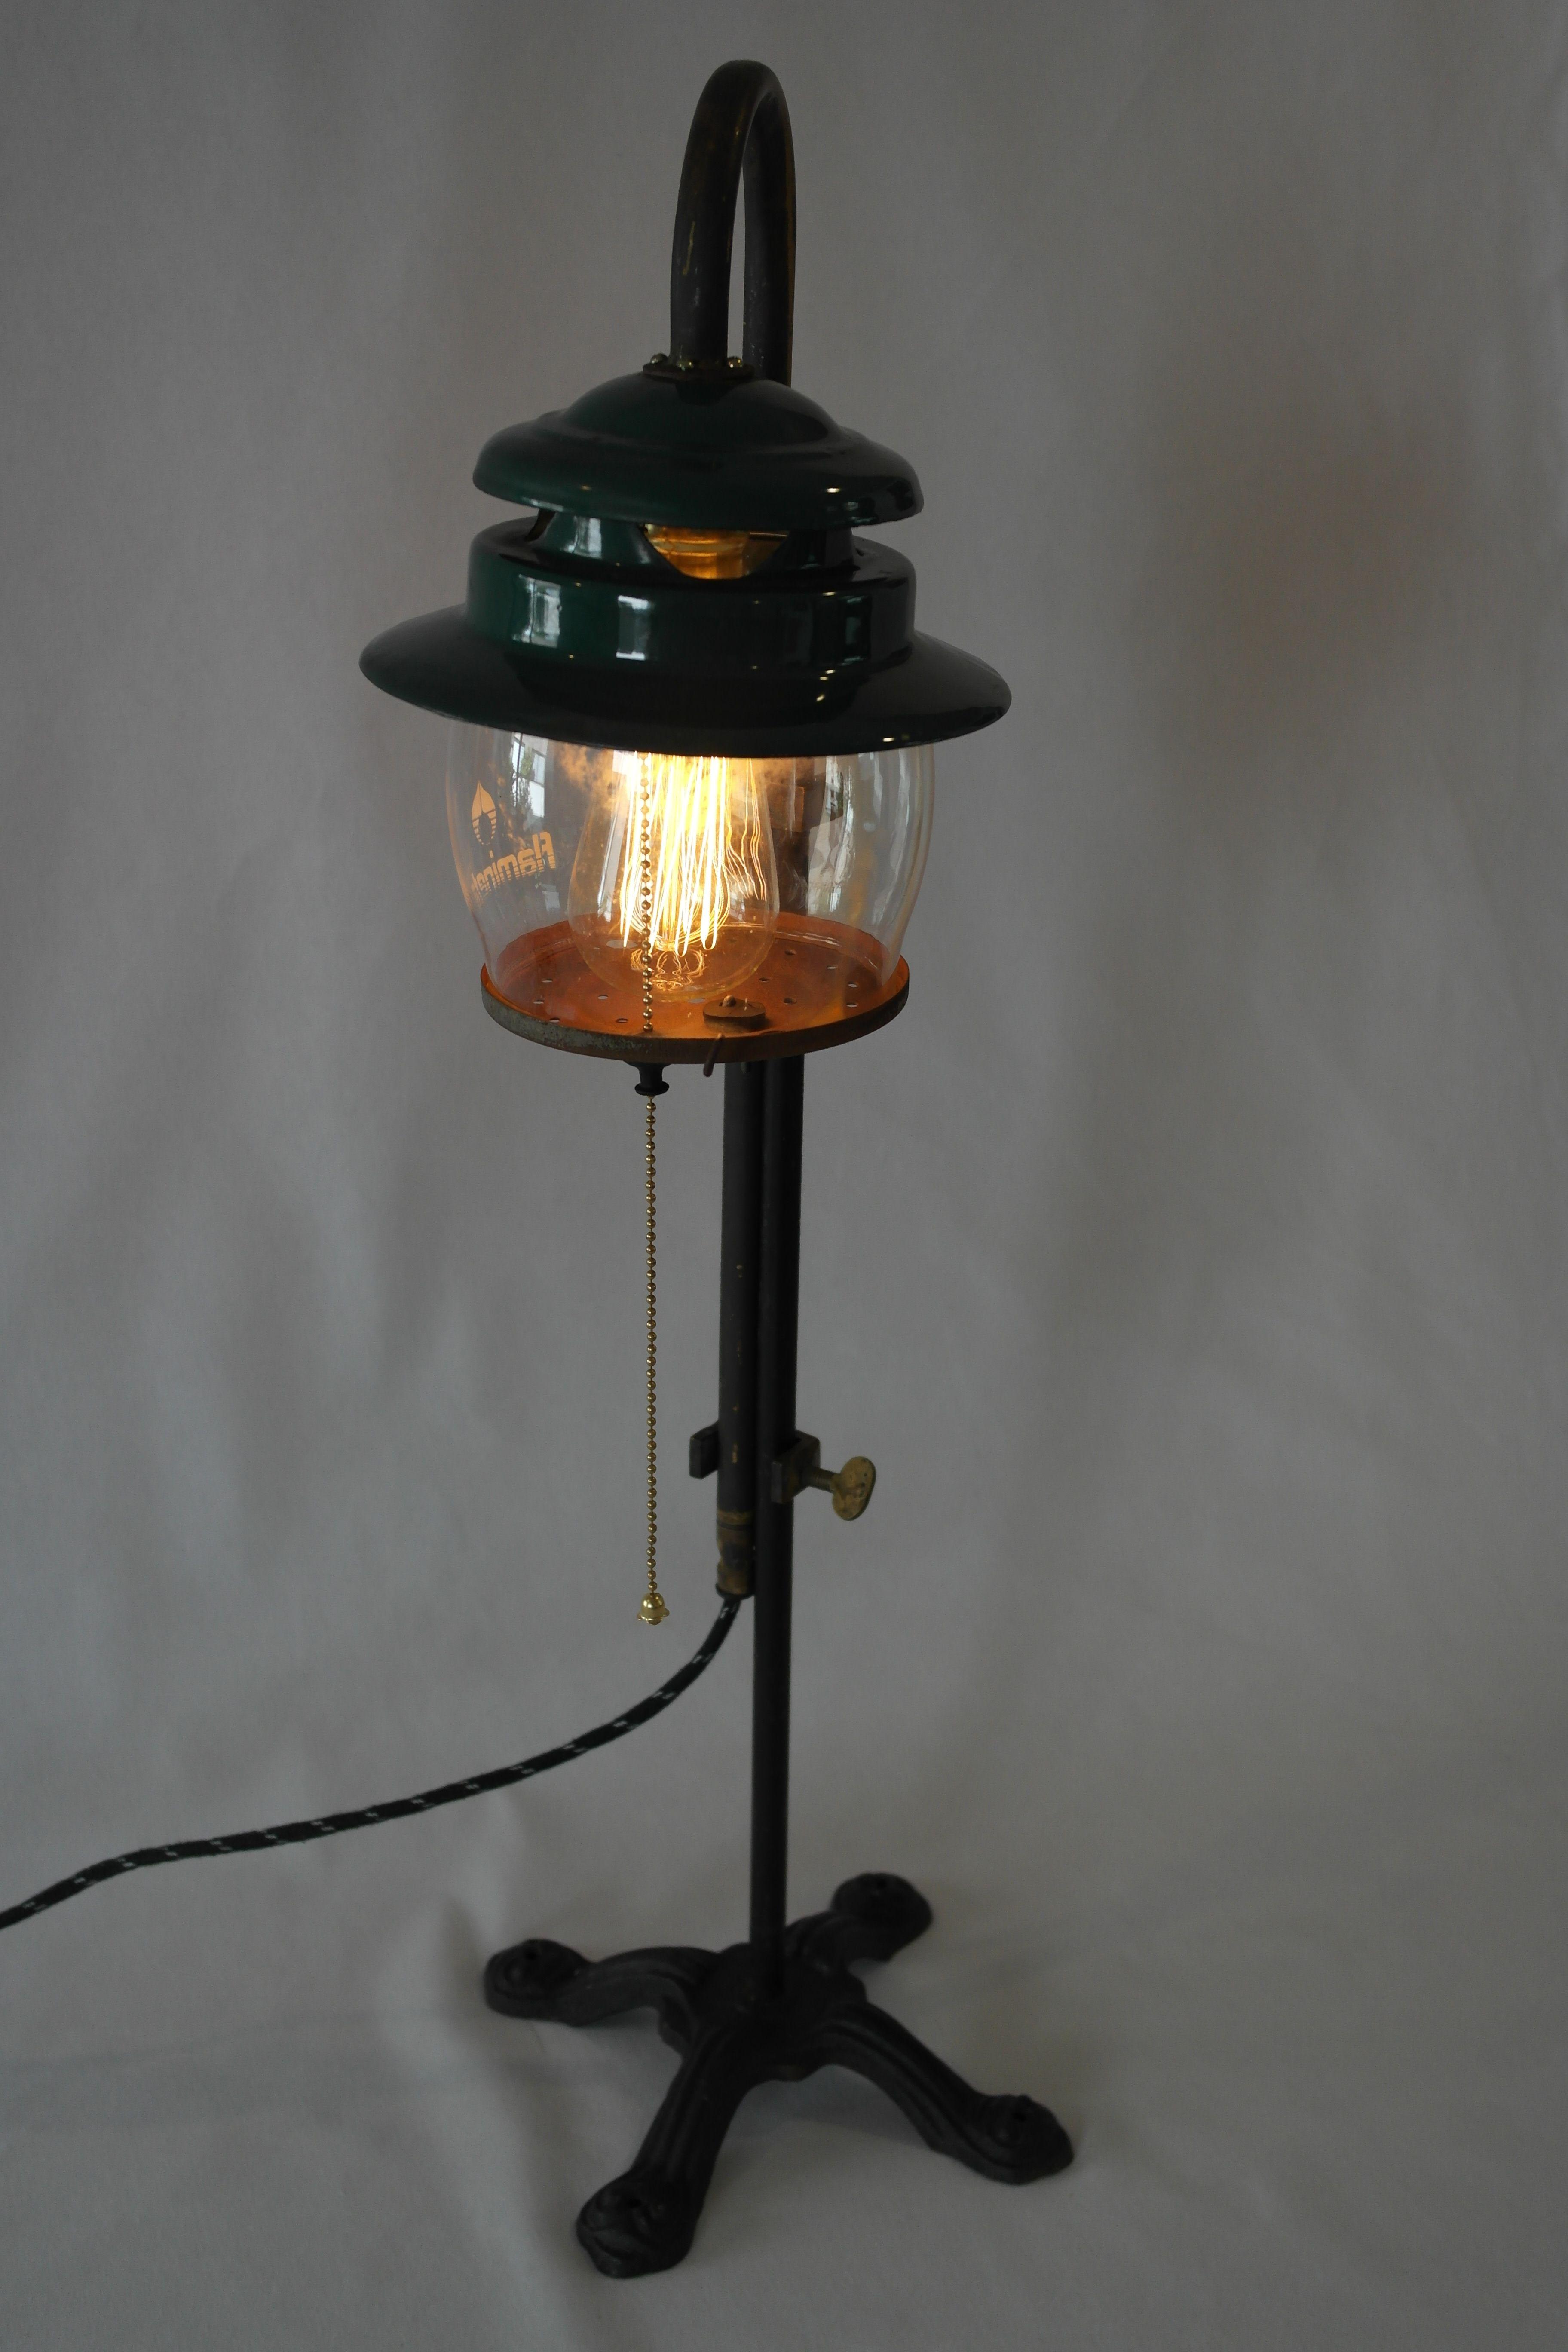 L mpara vintage antigua modelo black out bitch - Lamparas que den mucha luz ...